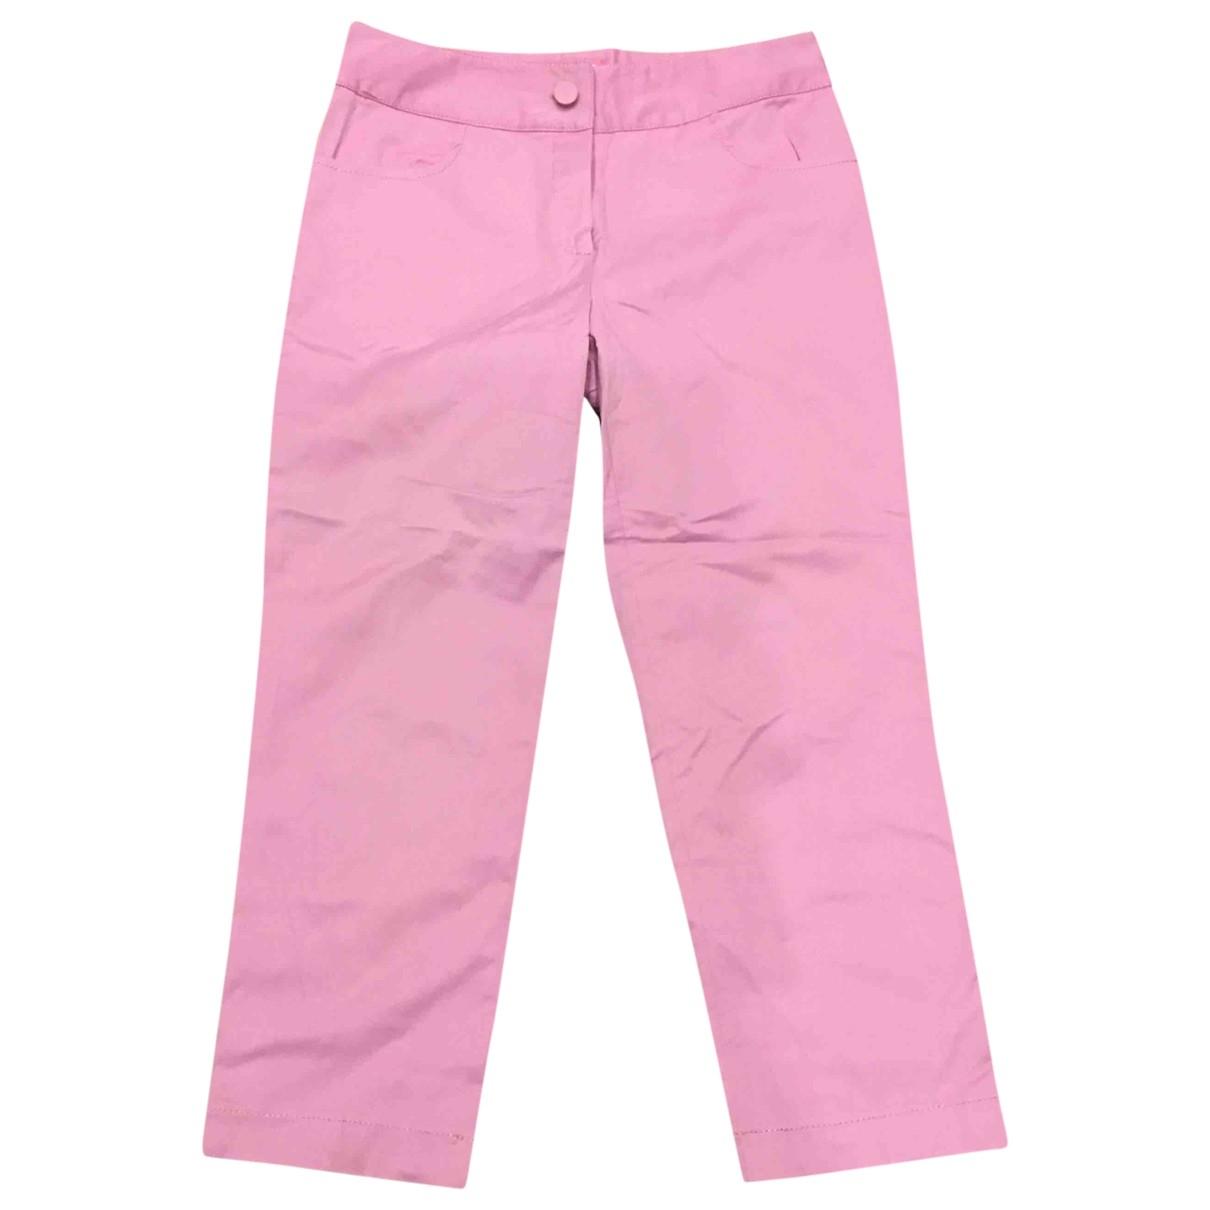 Blumarine \N Pink Cotton Trousers for Women 38 IT